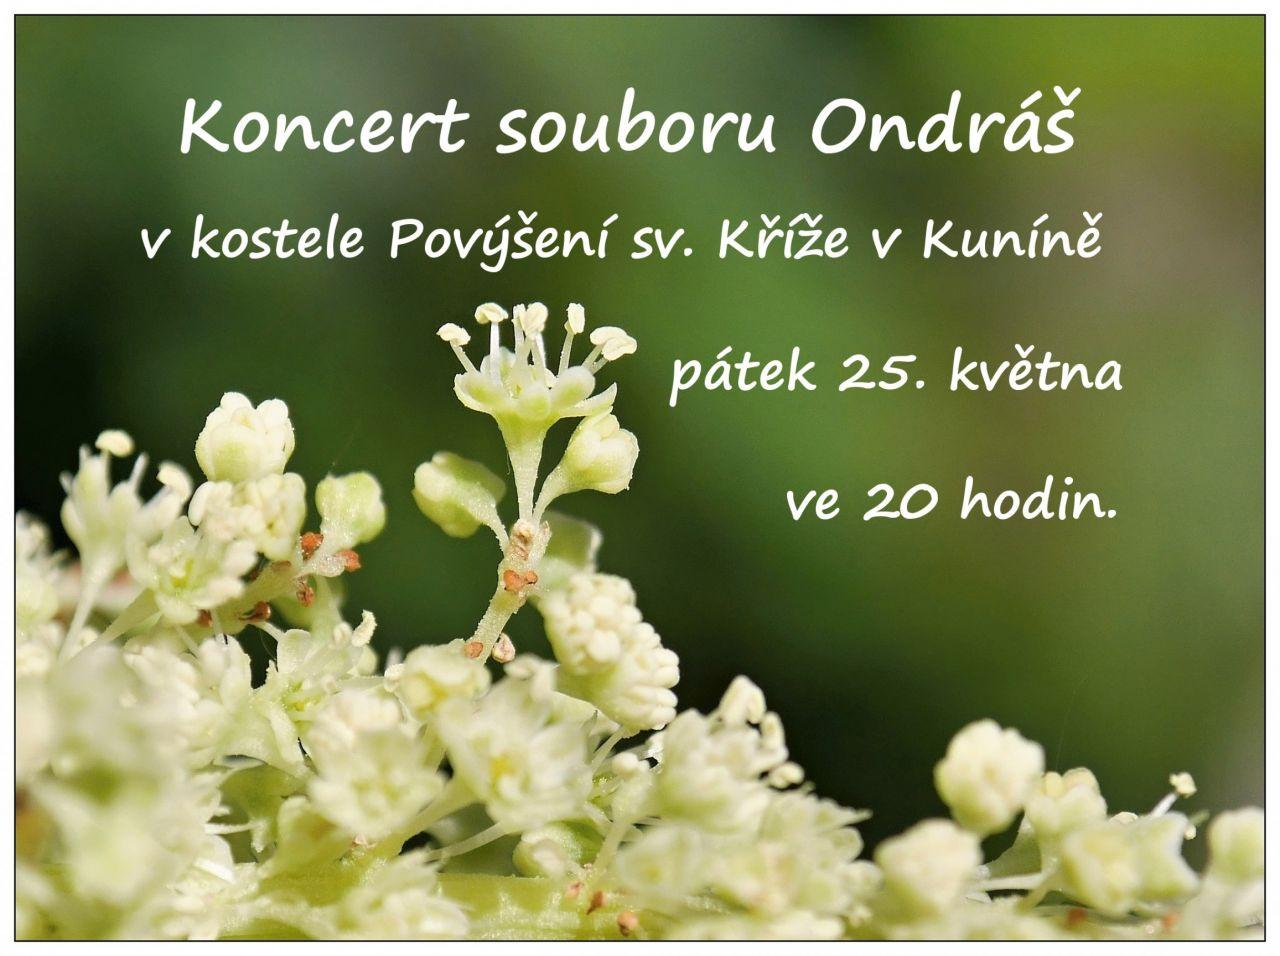 Koncert souboru Ondráš 1